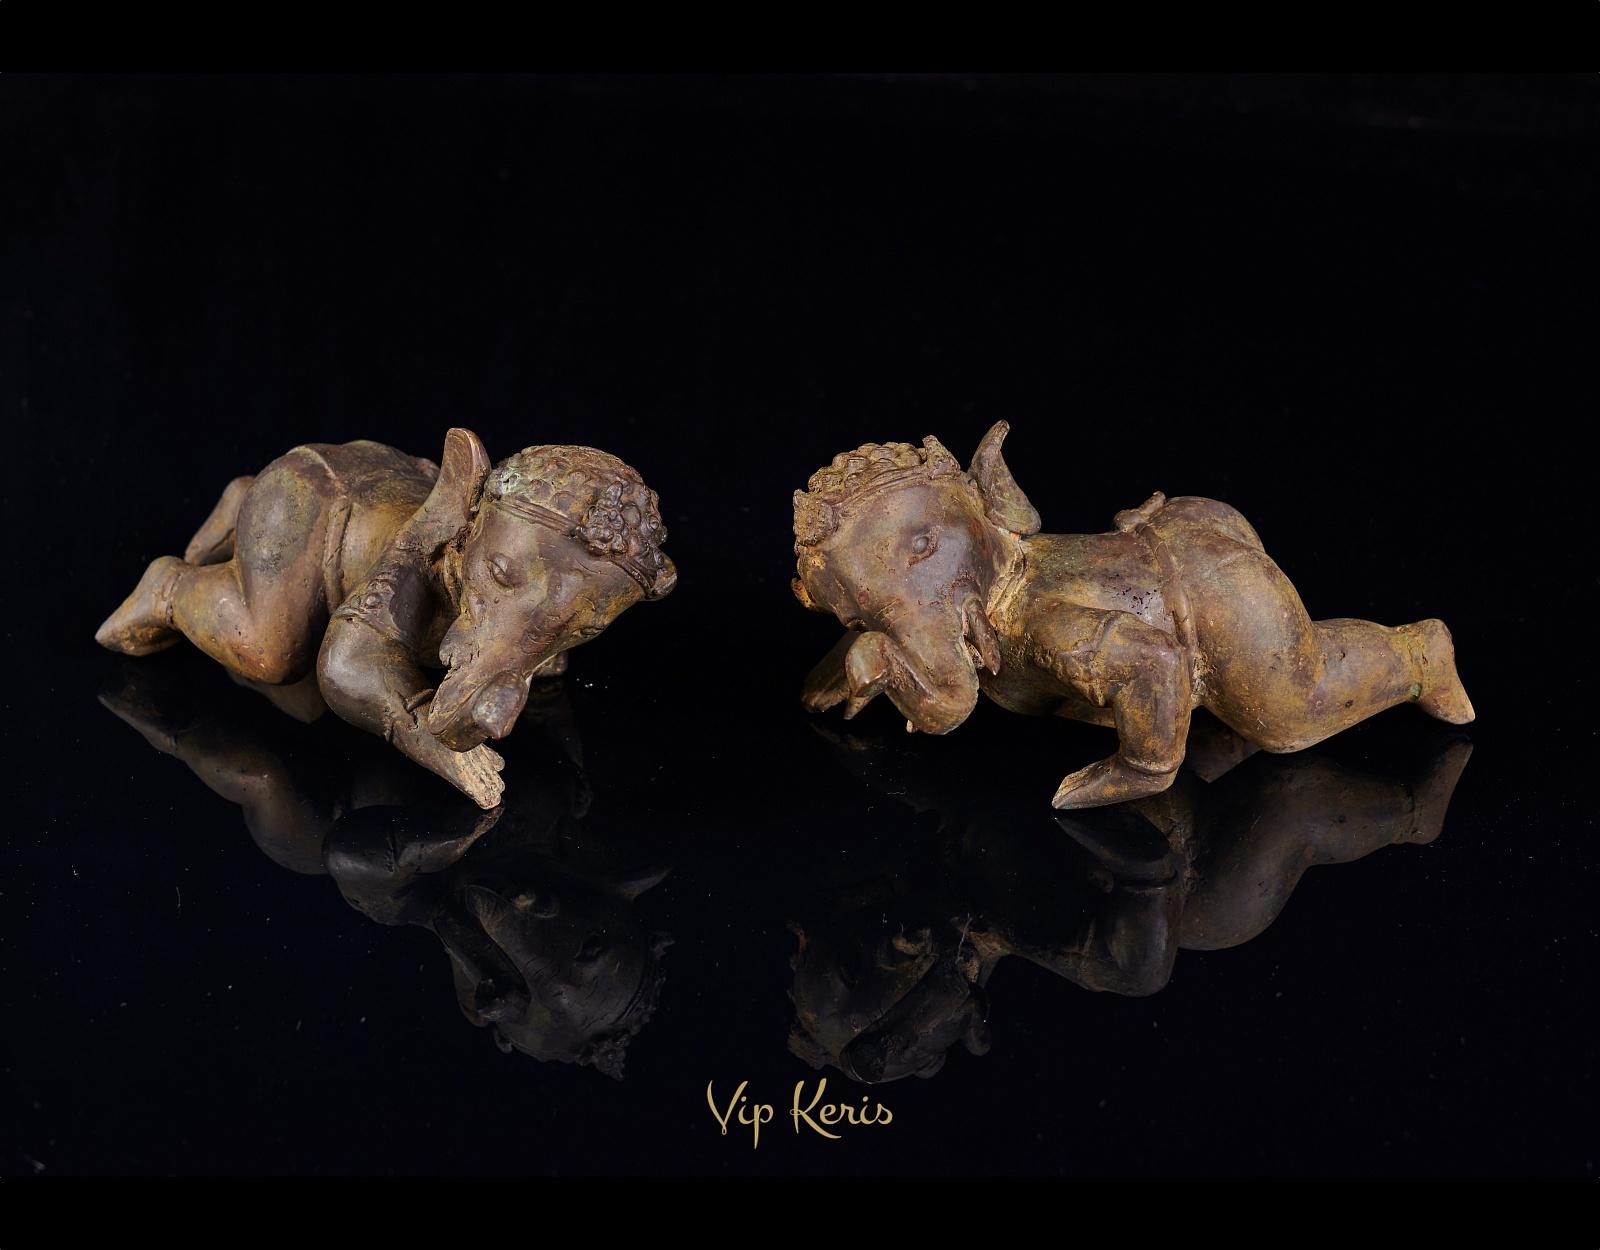 Две статуи малышей Ганеша фото VipKeris